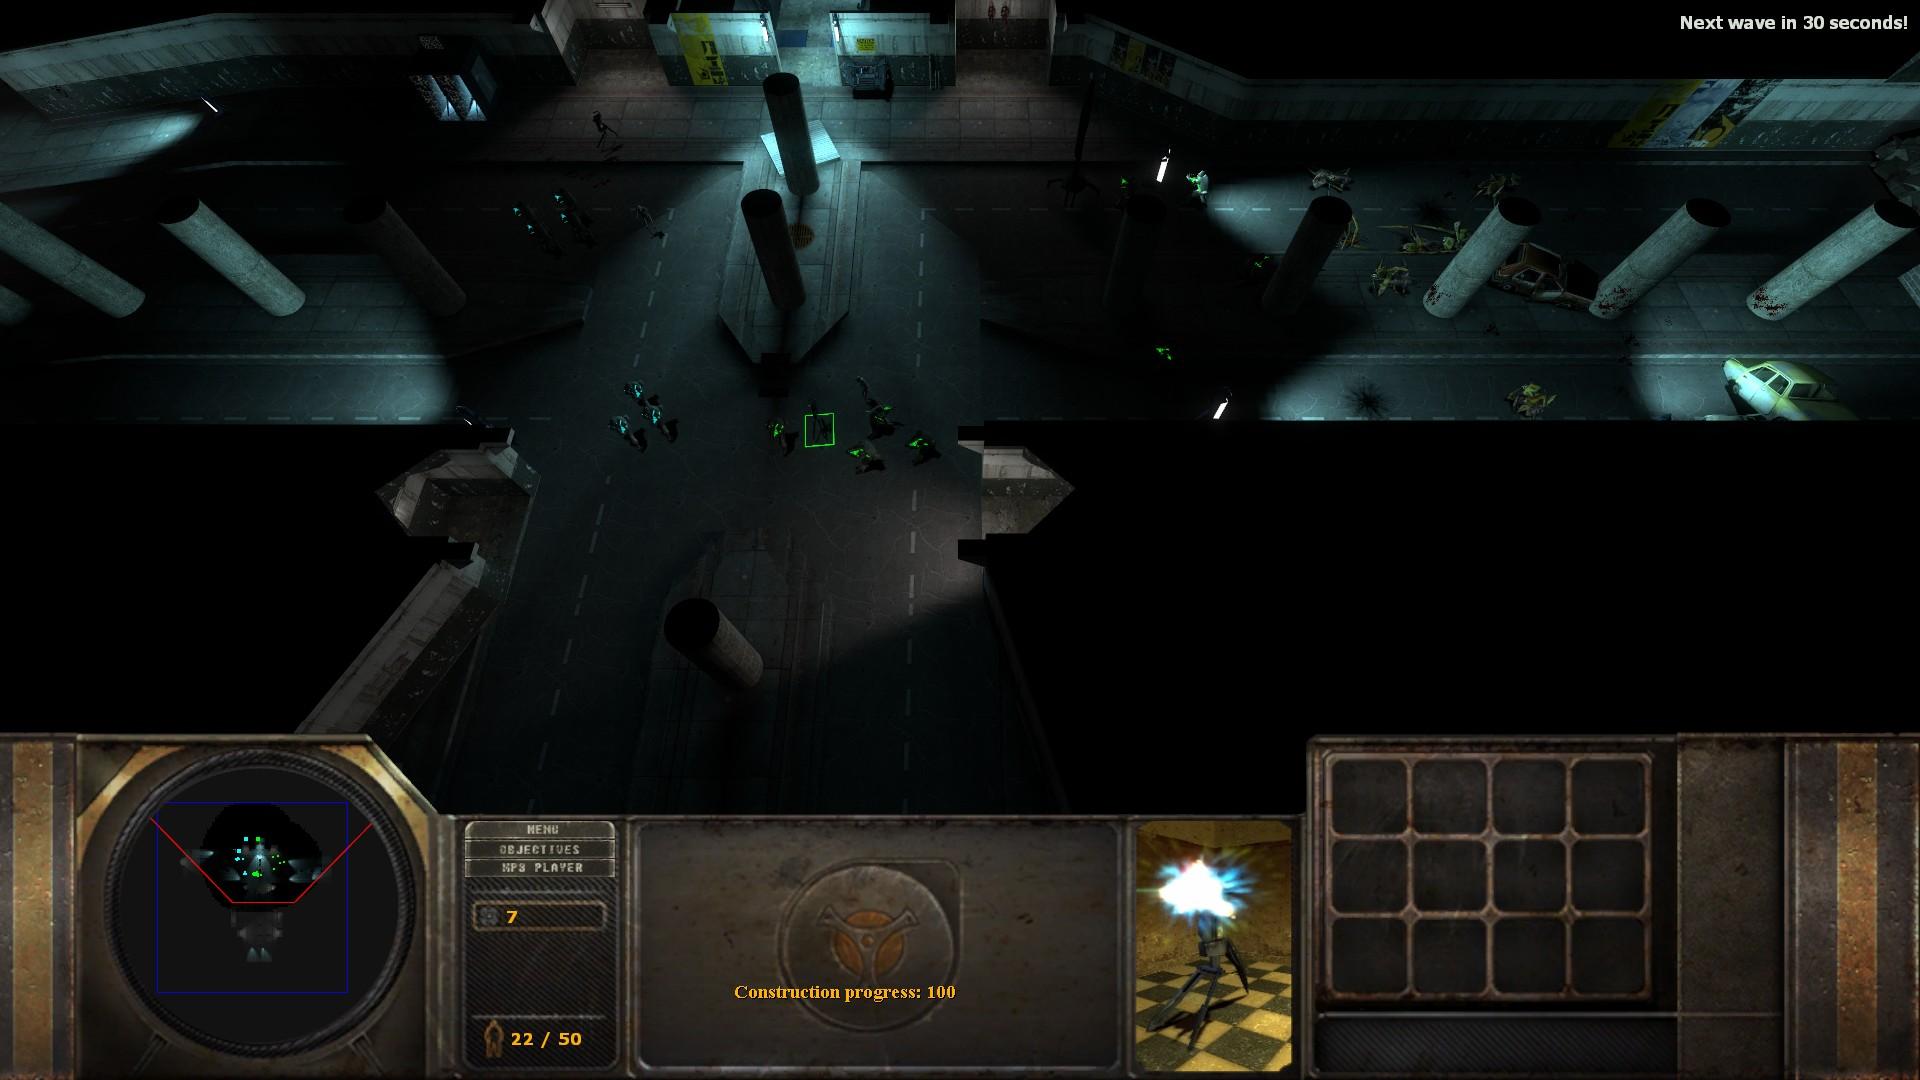 Half-Life 2: Wars Beta 1 0 4 PATCH ZIP file - Mod DB